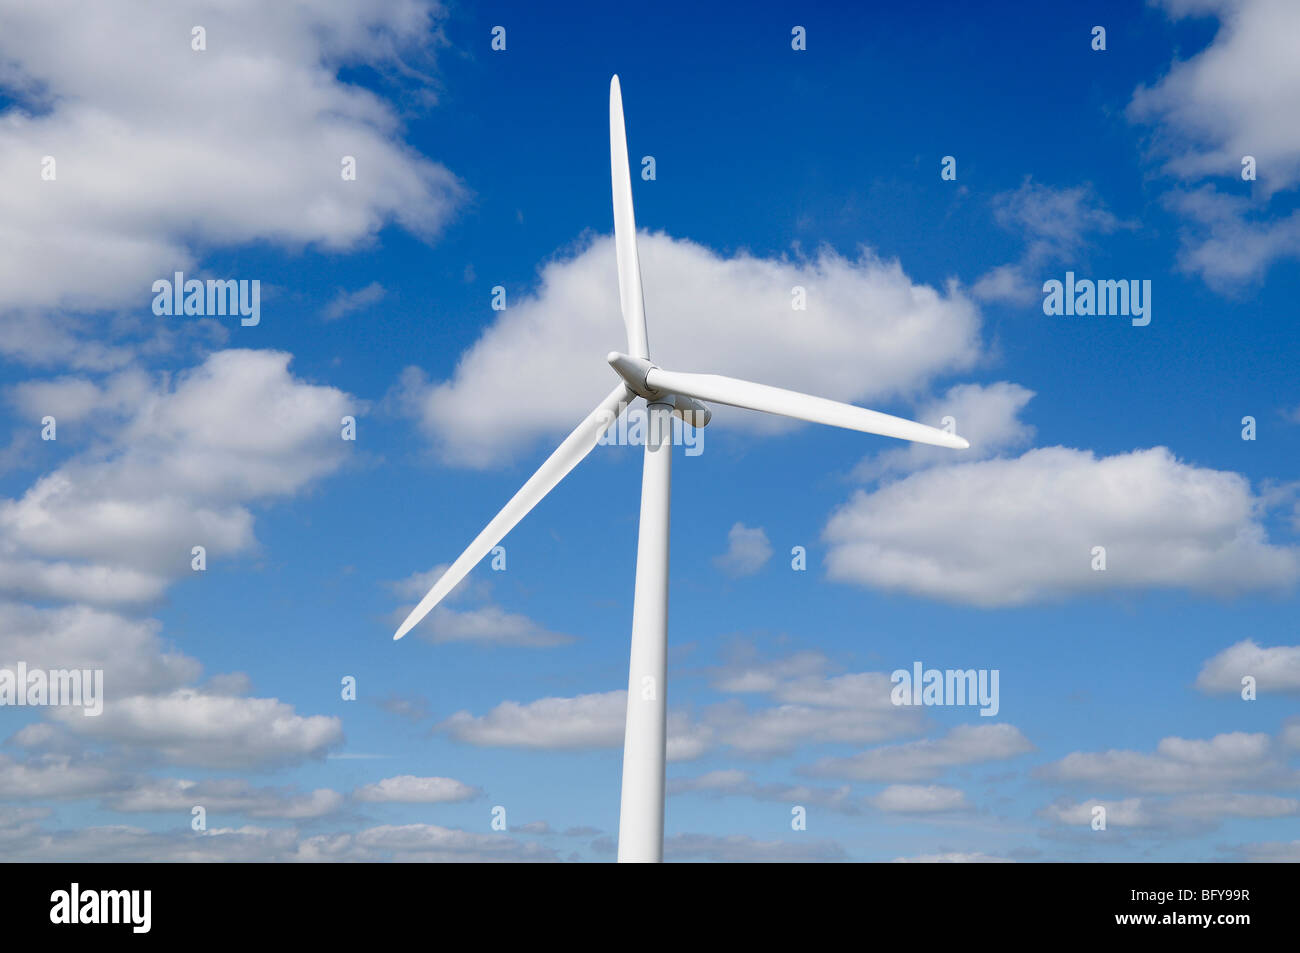 Windkraftanlage vor blauem Himmel Wolke gefüllt Stockbild